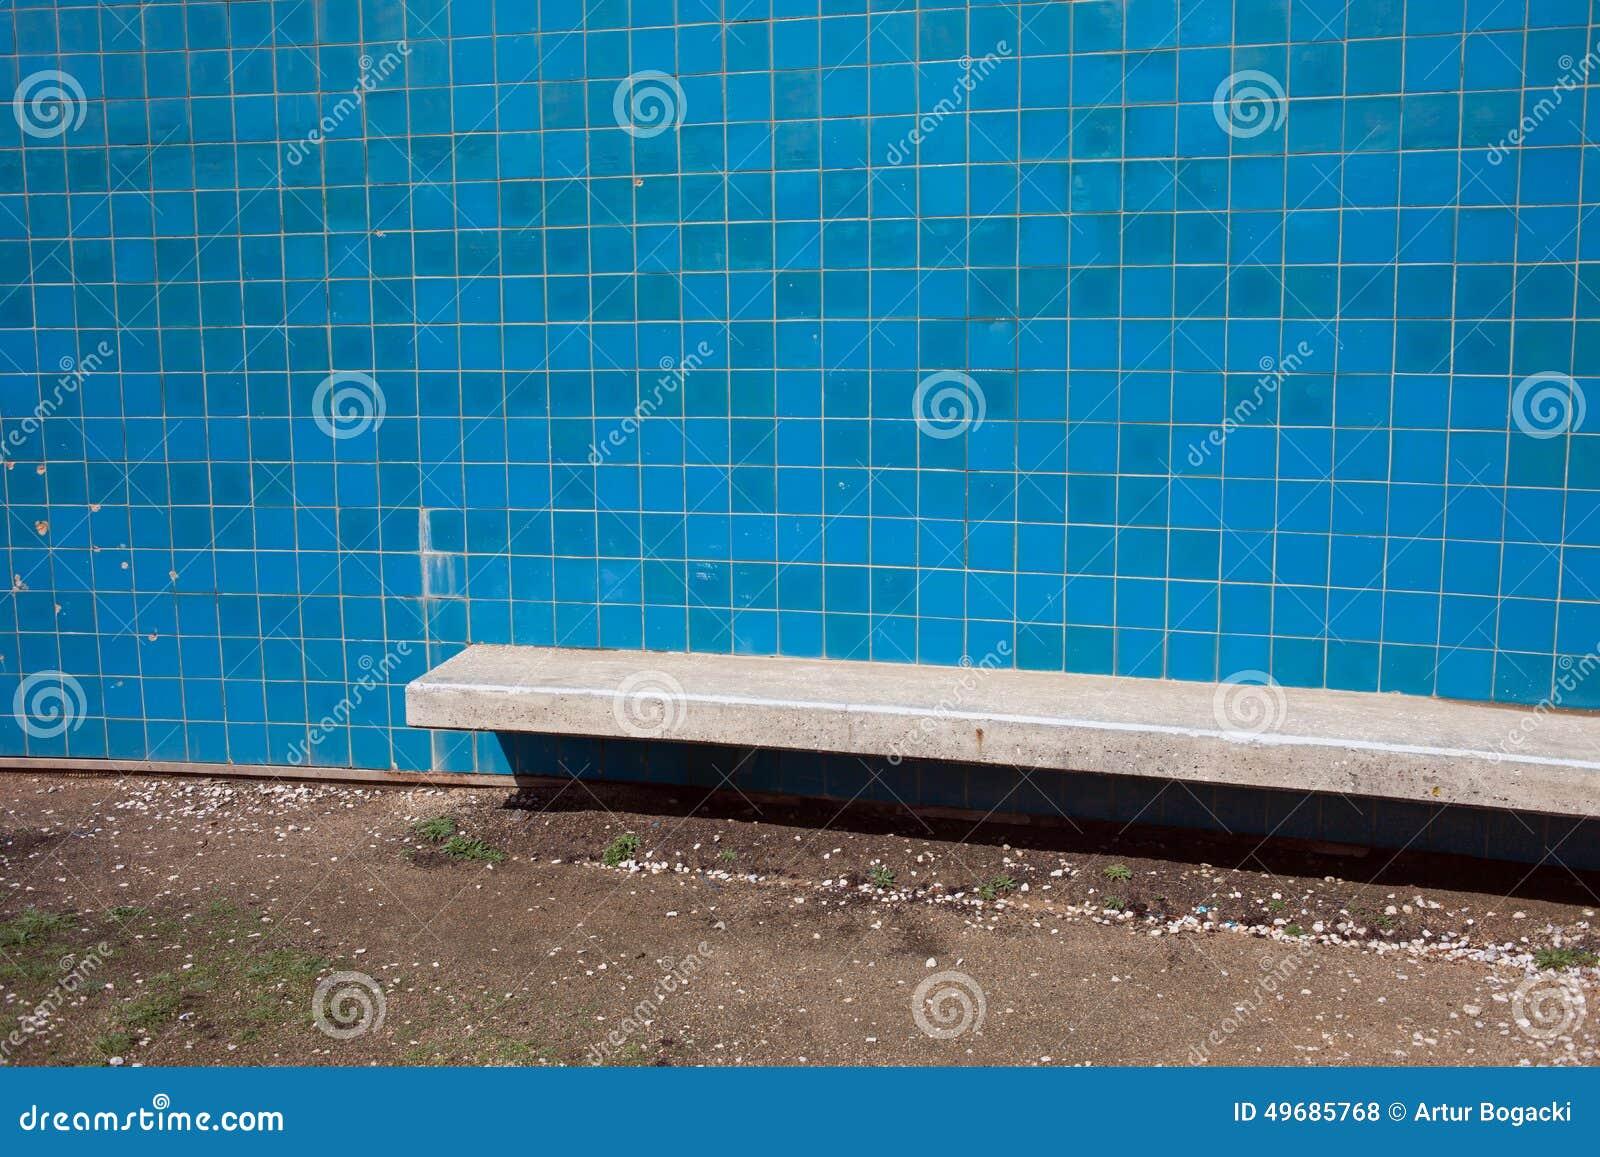 blaue fliesen wand mit bank stockfoto bild 49685768. Black Bedroom Furniture Sets. Home Design Ideas